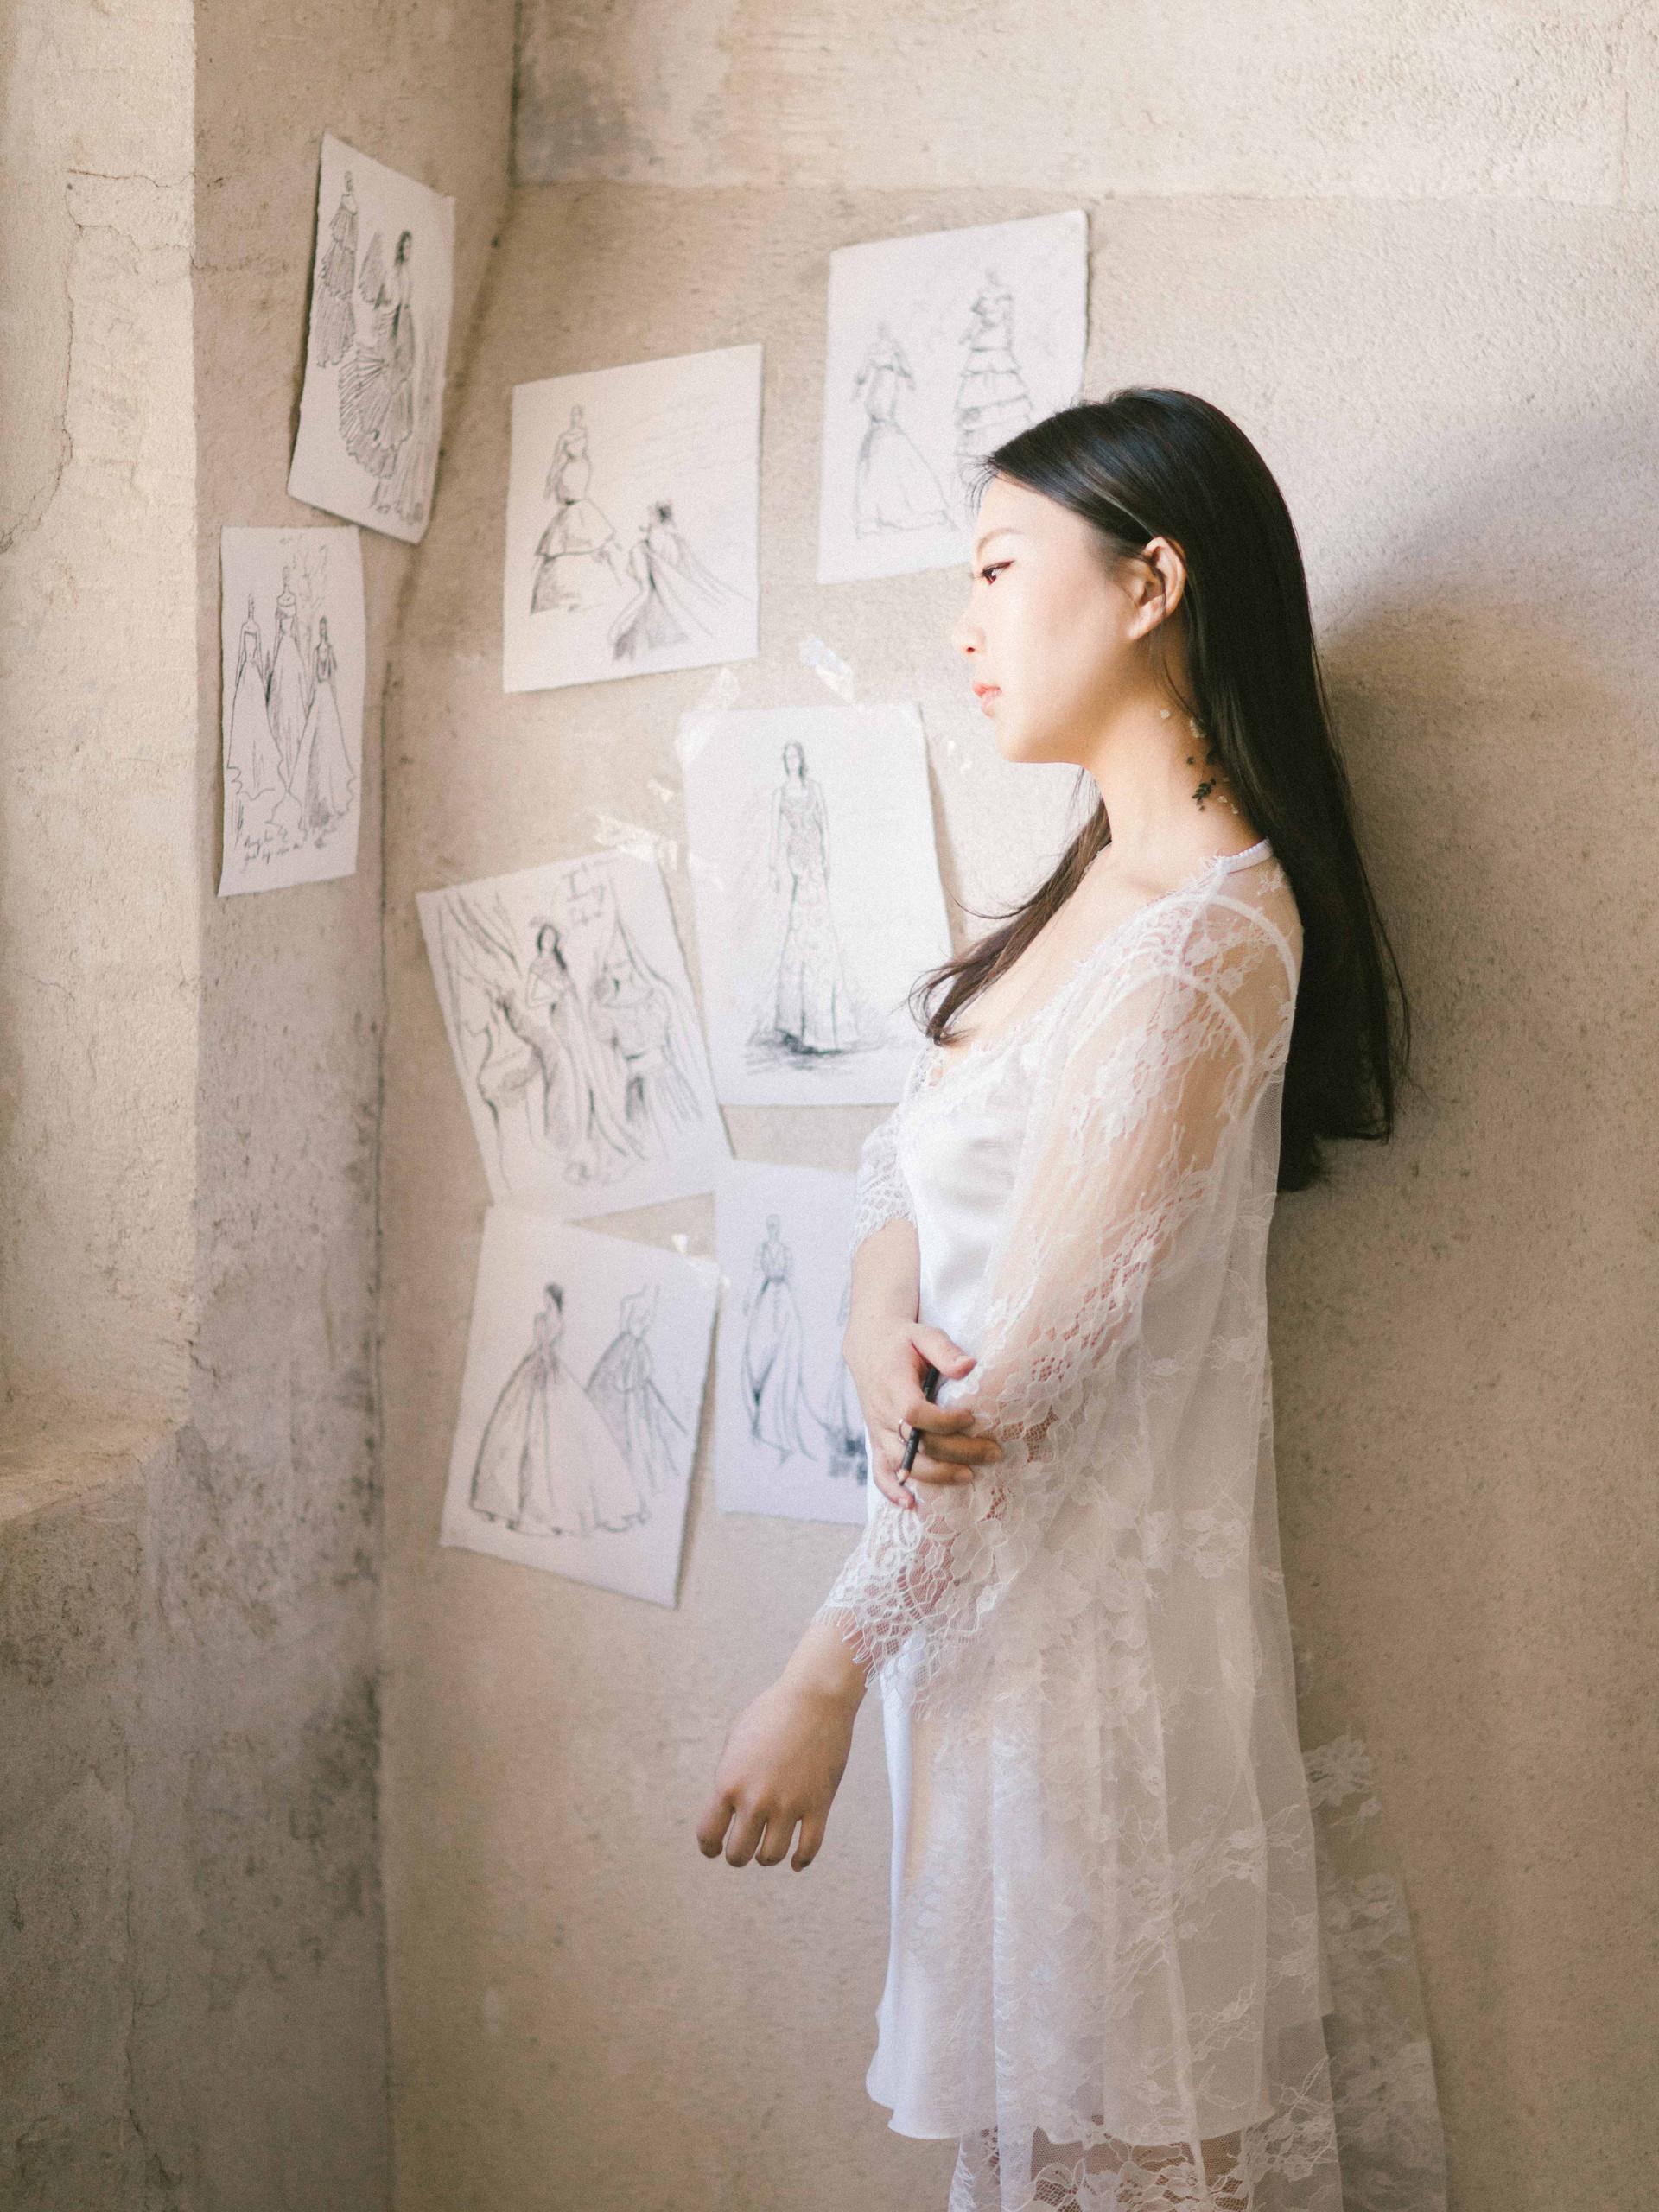 Lukas Chan Photo Lab - Ivy Solo - website-30.jpg